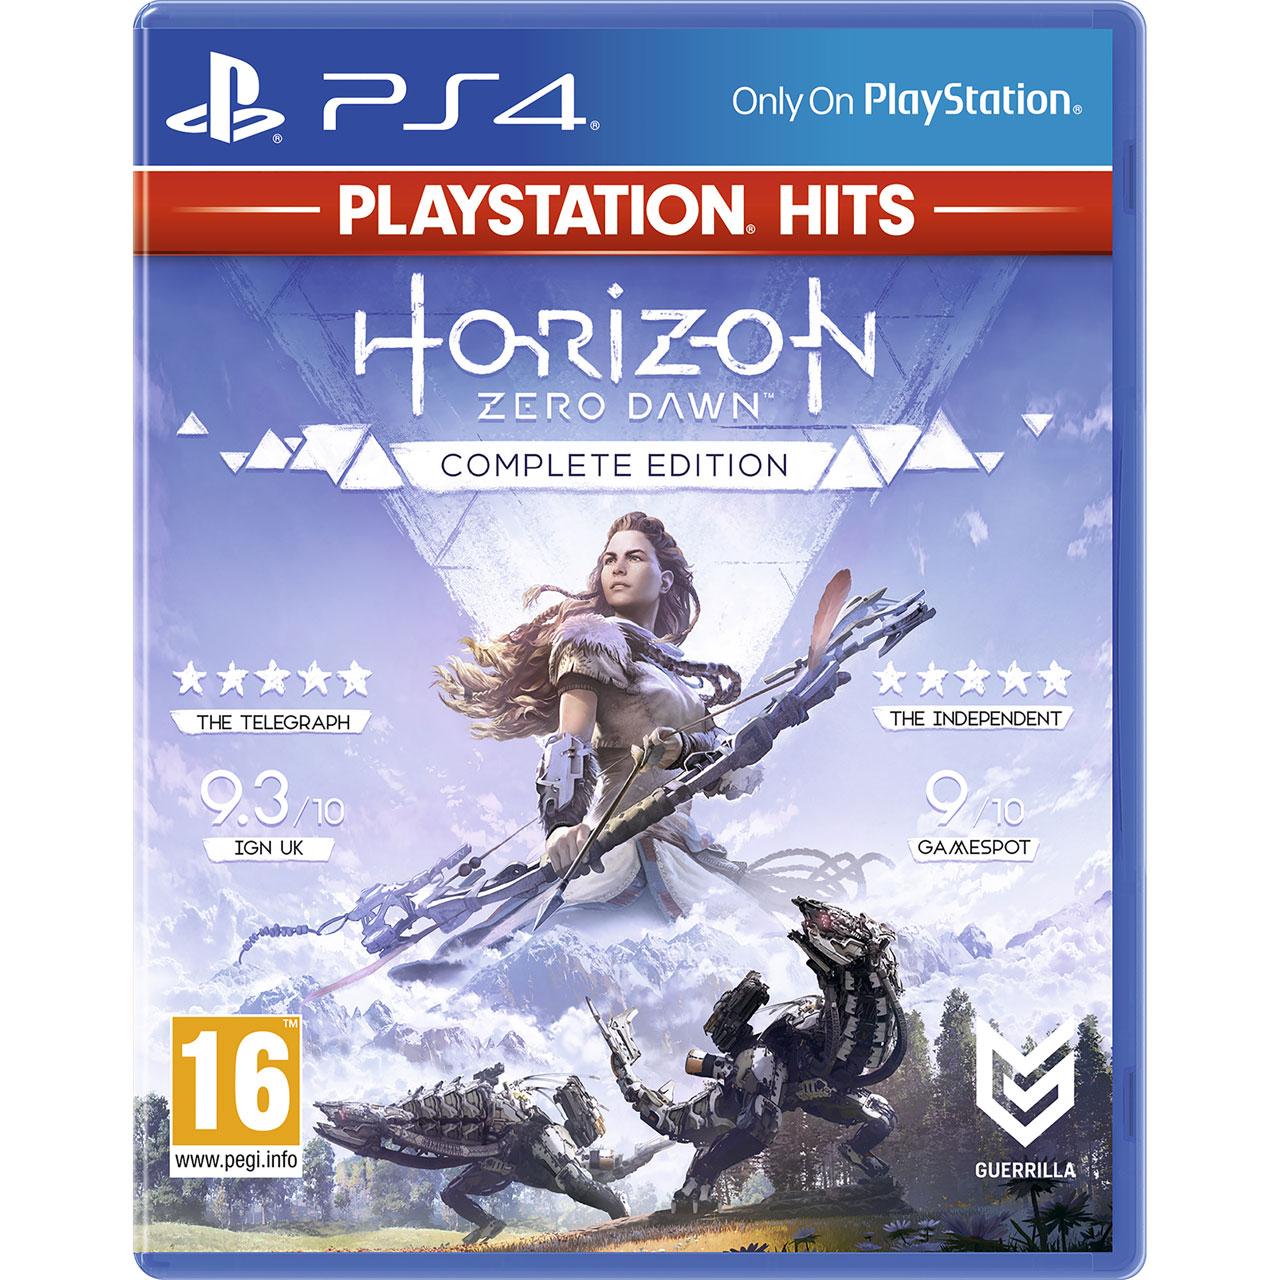 Horizon Zero Dawn: Playstation Hits (PS4) - £9 Delivered @ AO